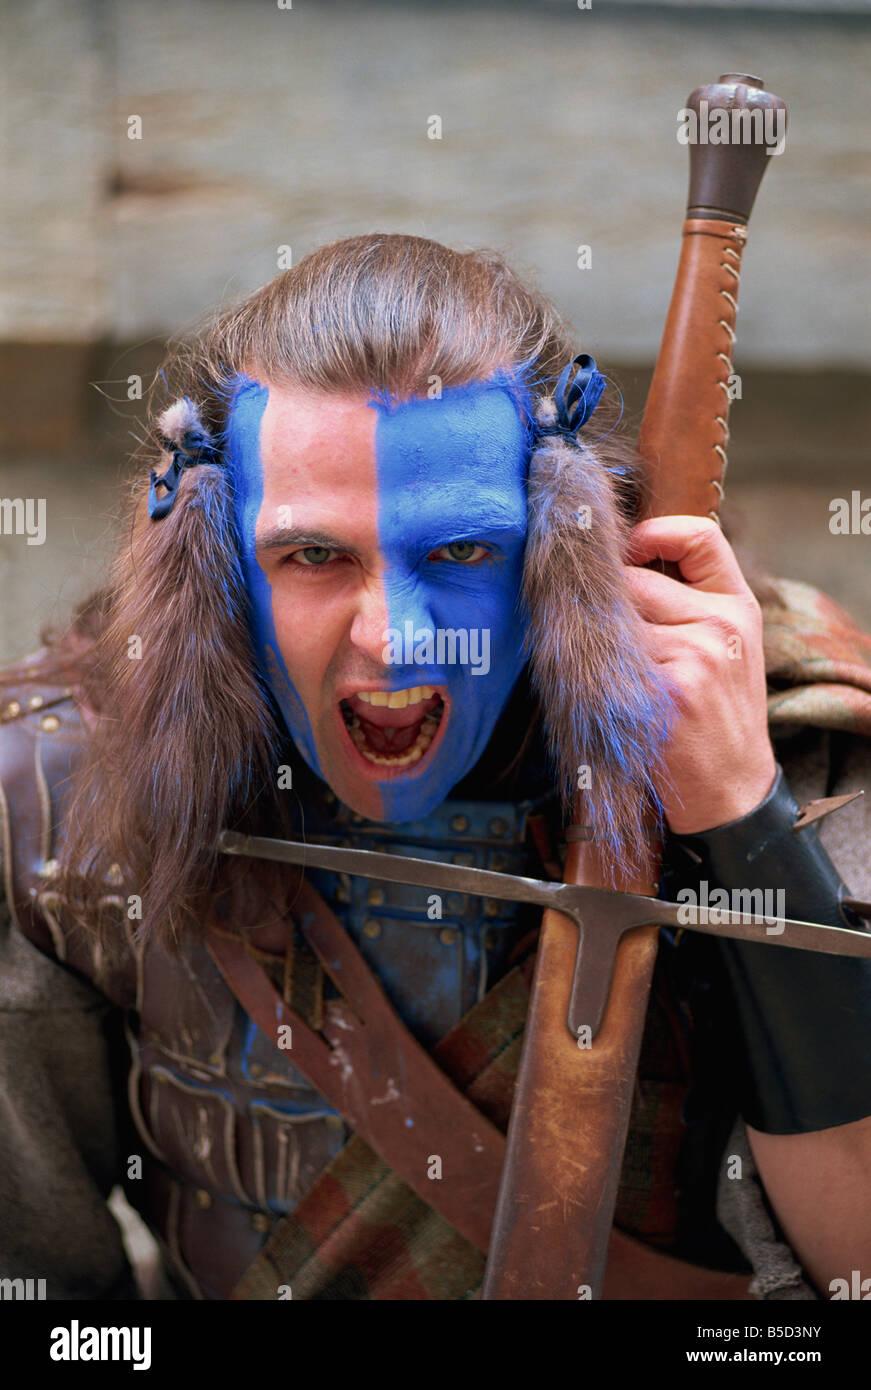 quot Braveheart quot Painted Highlander Edinburgh Scotland N Clark - Stock Image